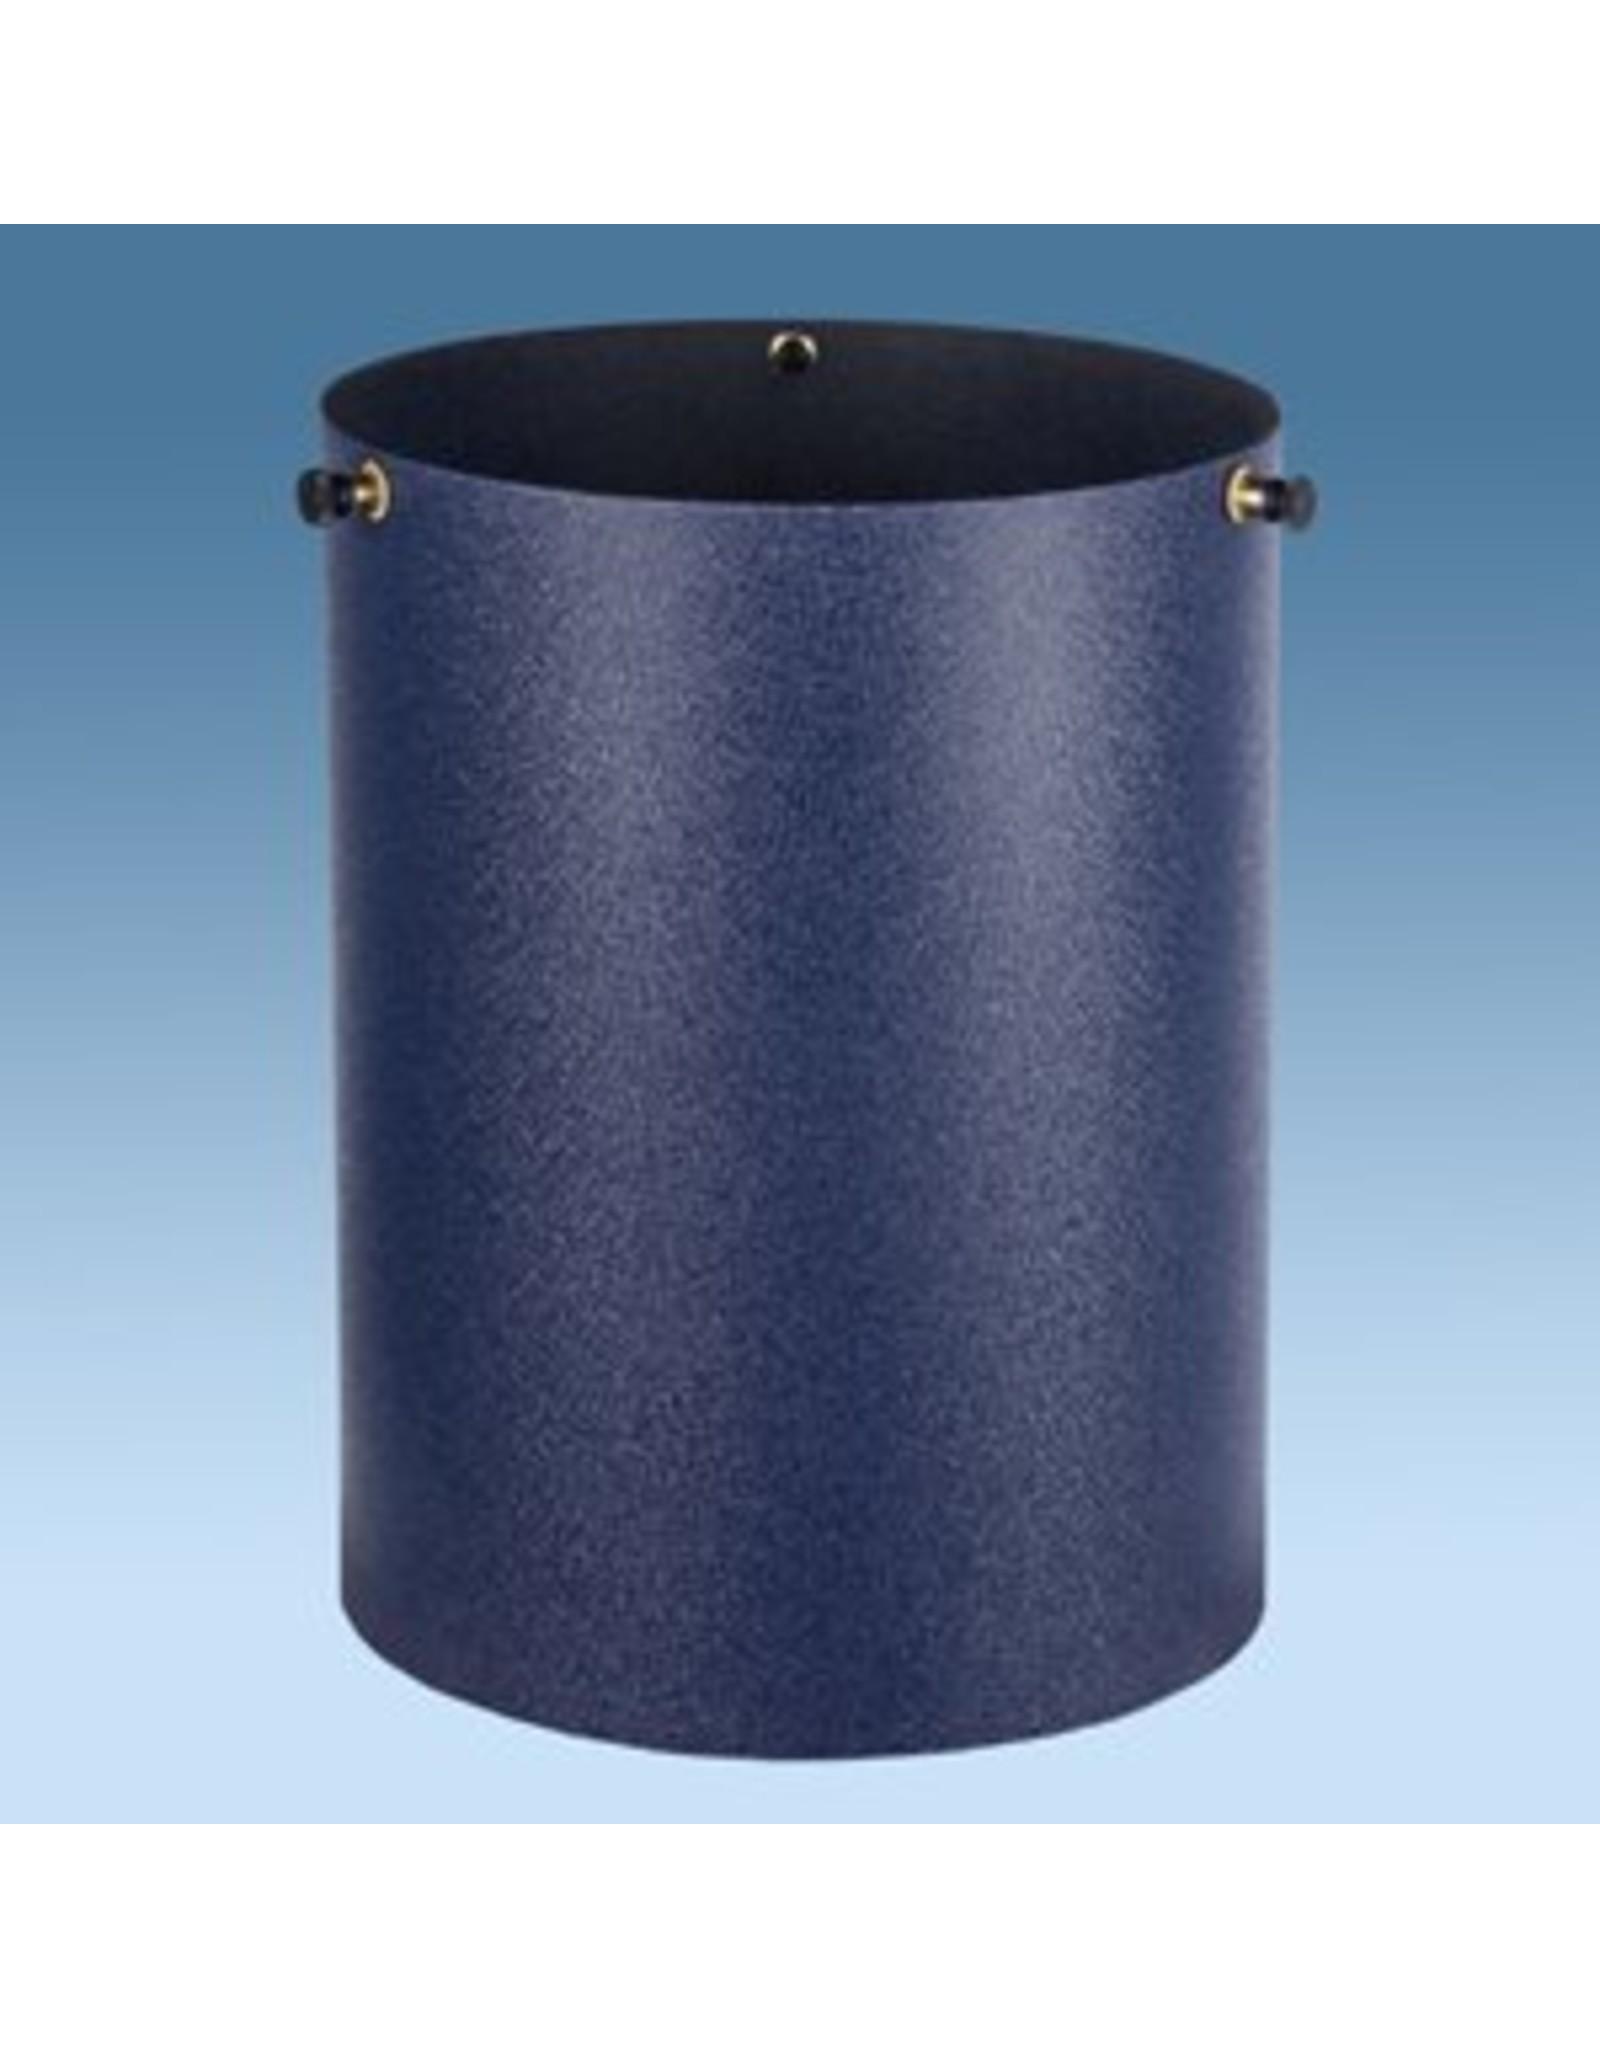 Astrozap AZ-216-T Meade 12 Sct LX90/LX200 Dew Shield Textured Blue